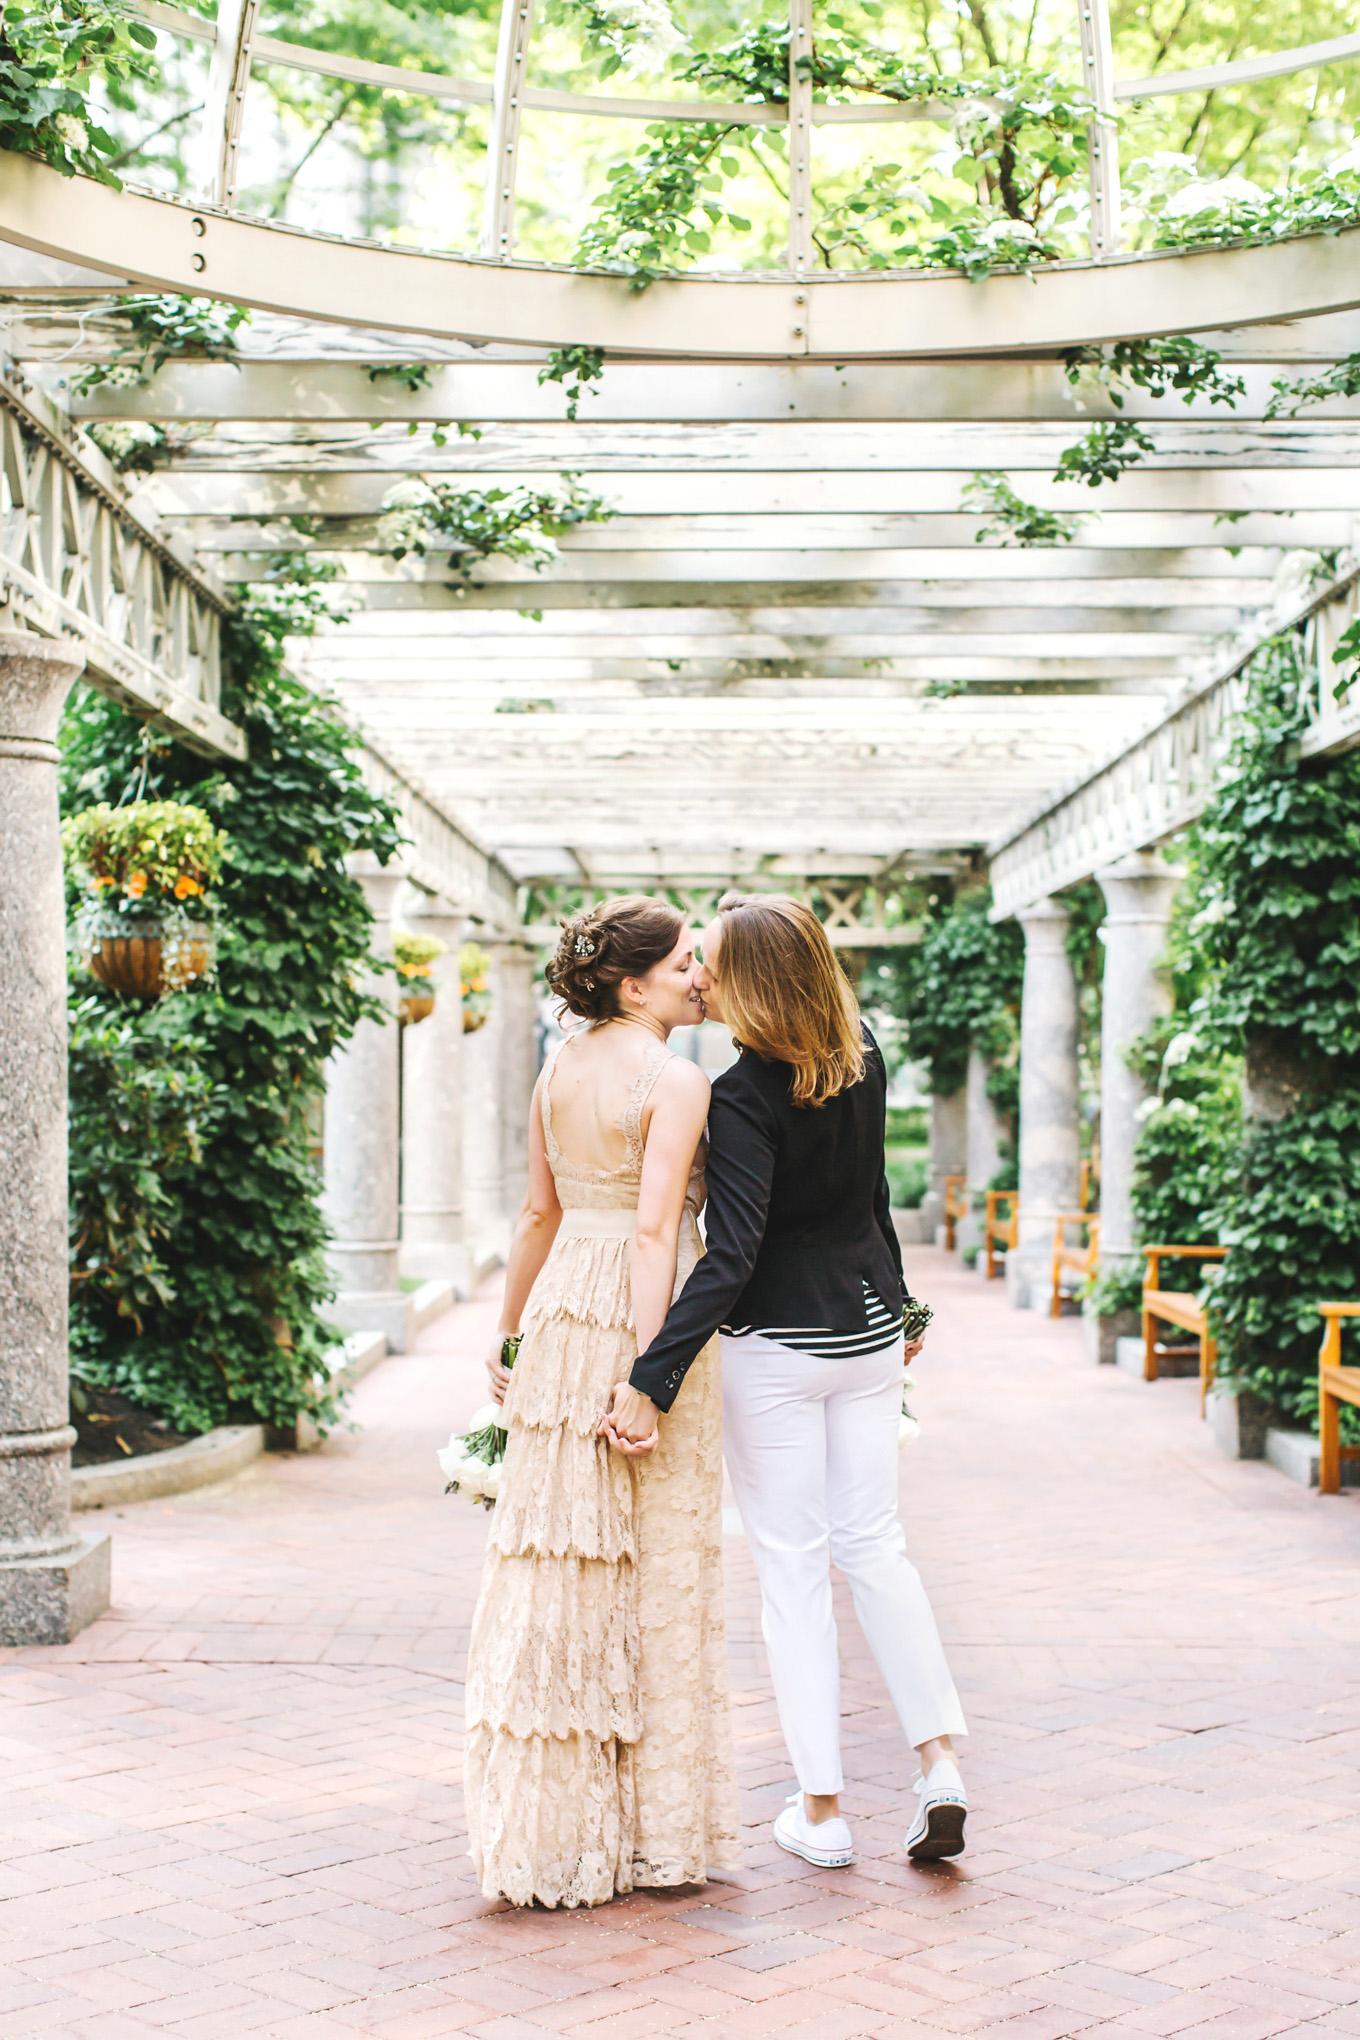 Boston_Wedding_Photographer_Lena_Mirisola-26.jpg